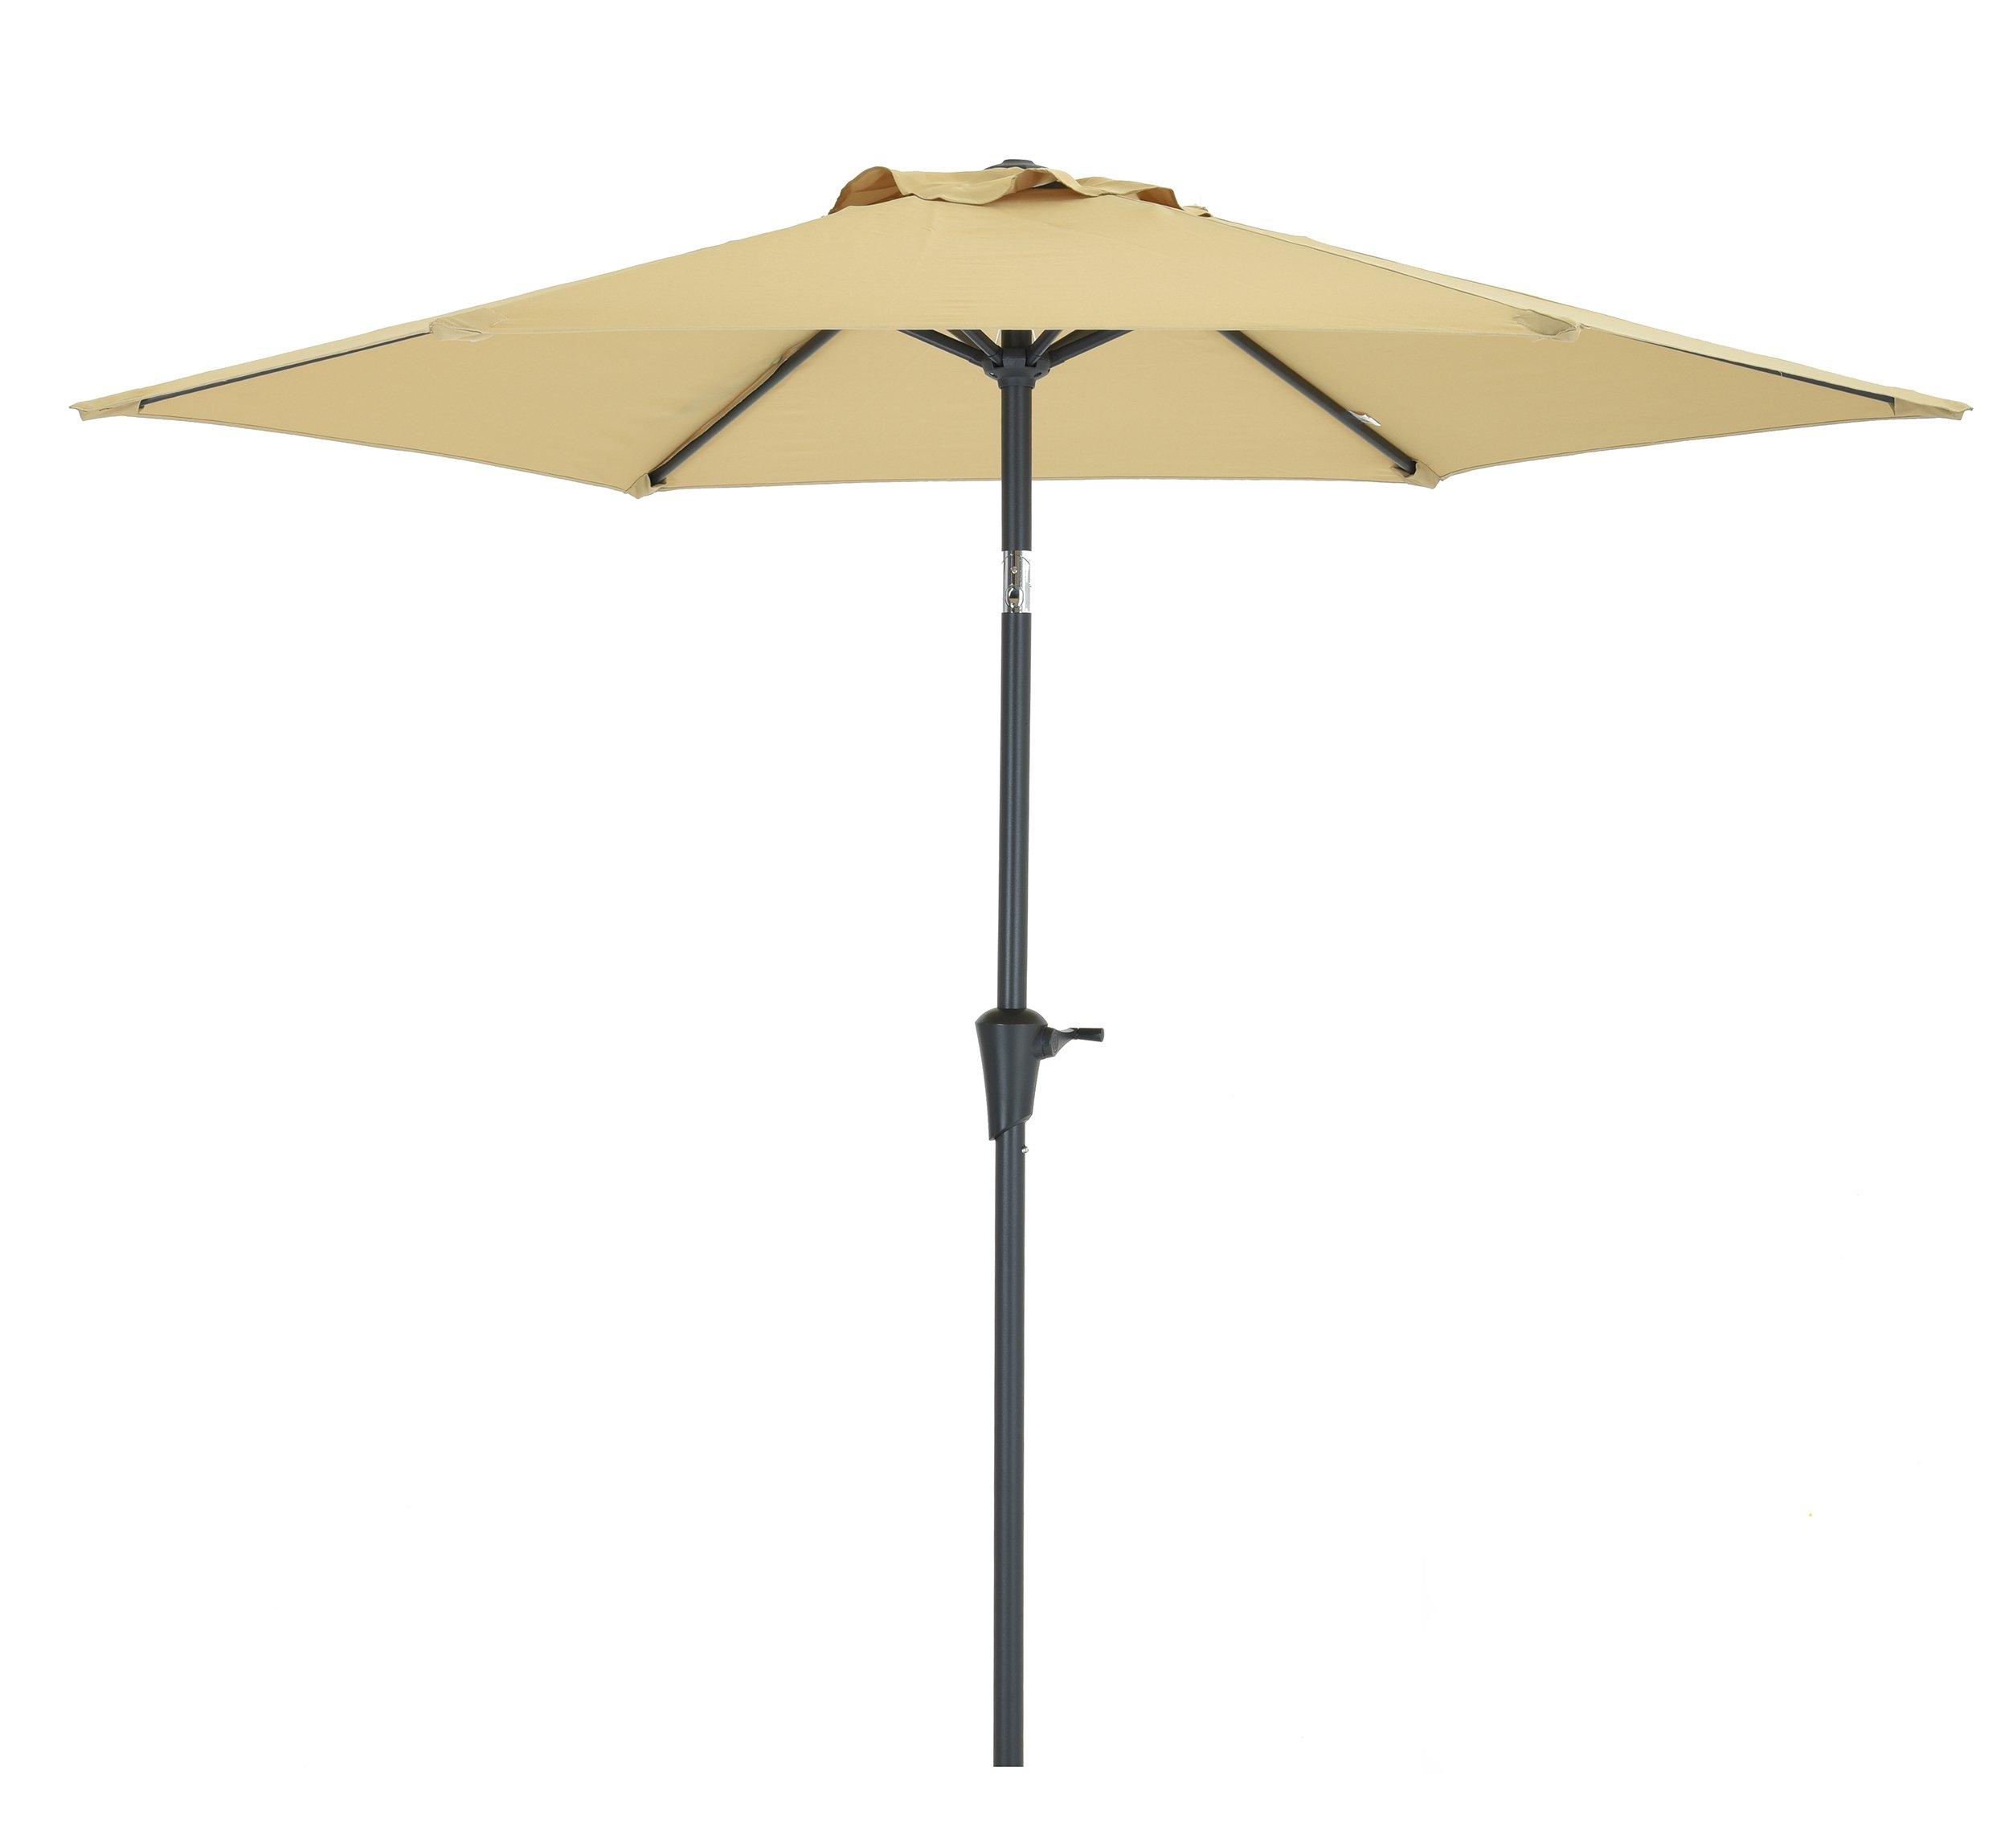 7.5 Ft Patio Umbrella, Garden Umbrella with 6 Ribs, Bistro Table Umbrella with Push Button Tilt and Crank,Beige